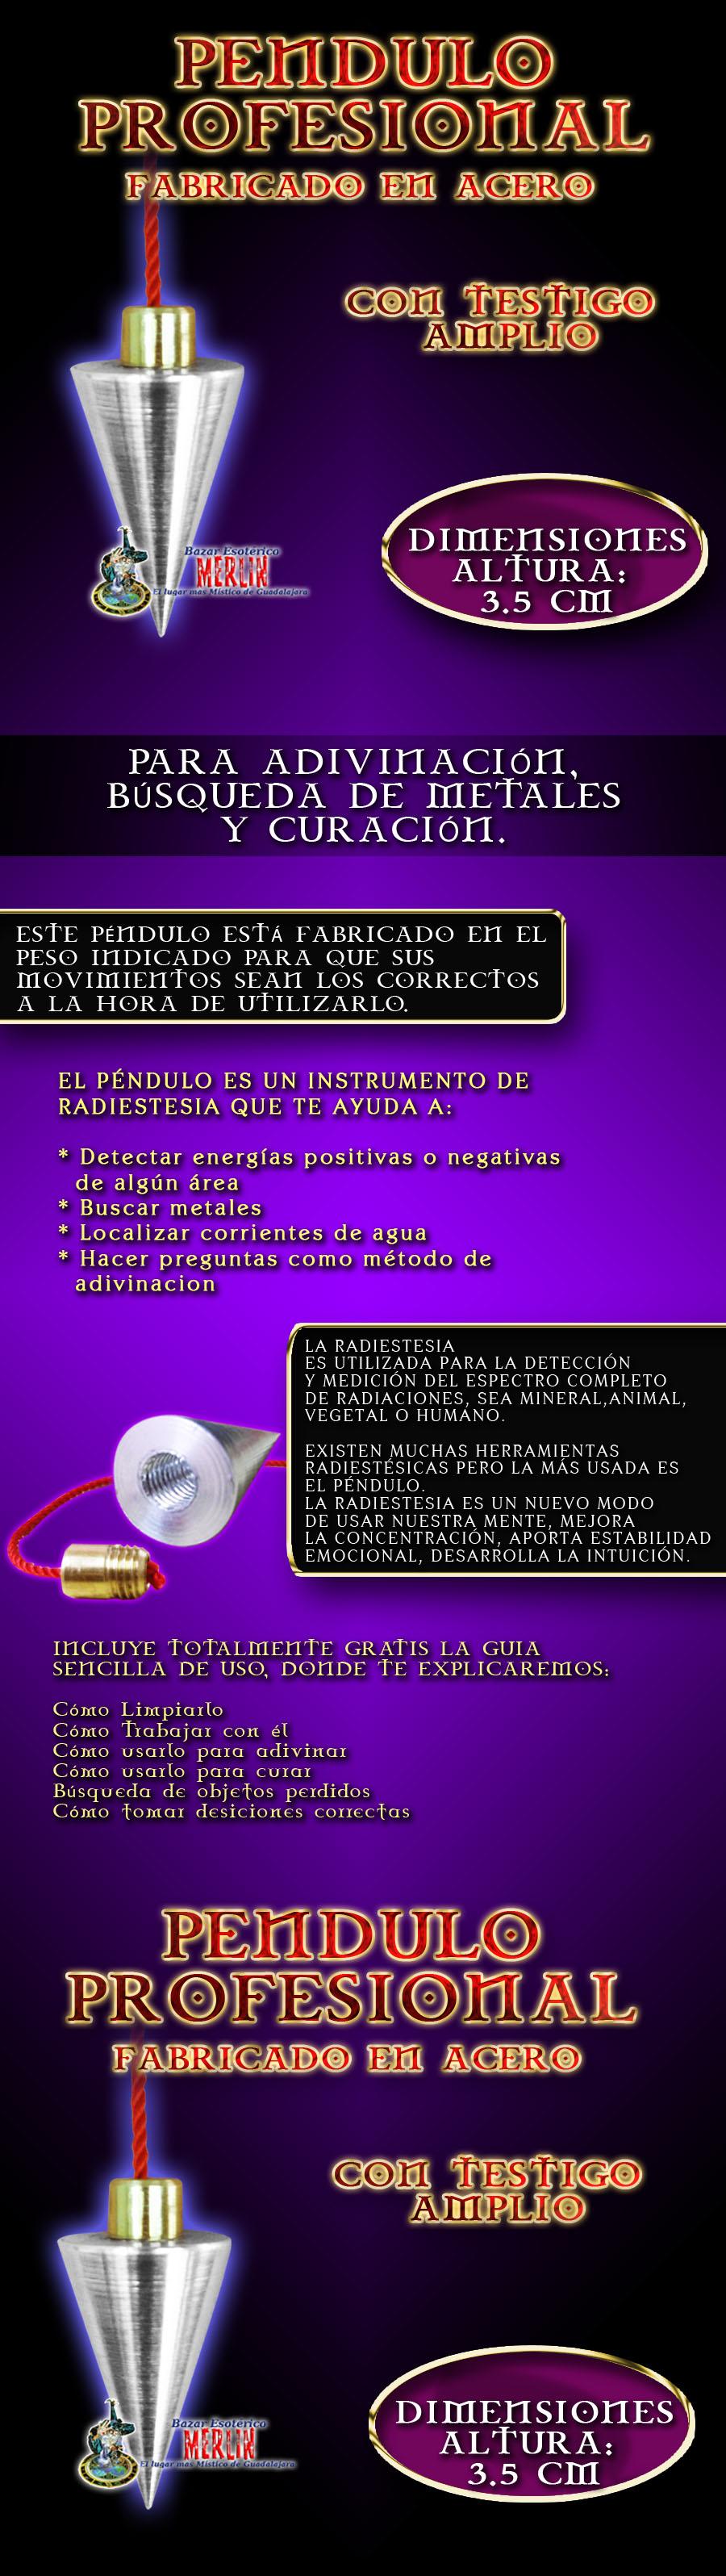 pendulo_profesional_acero_diseno